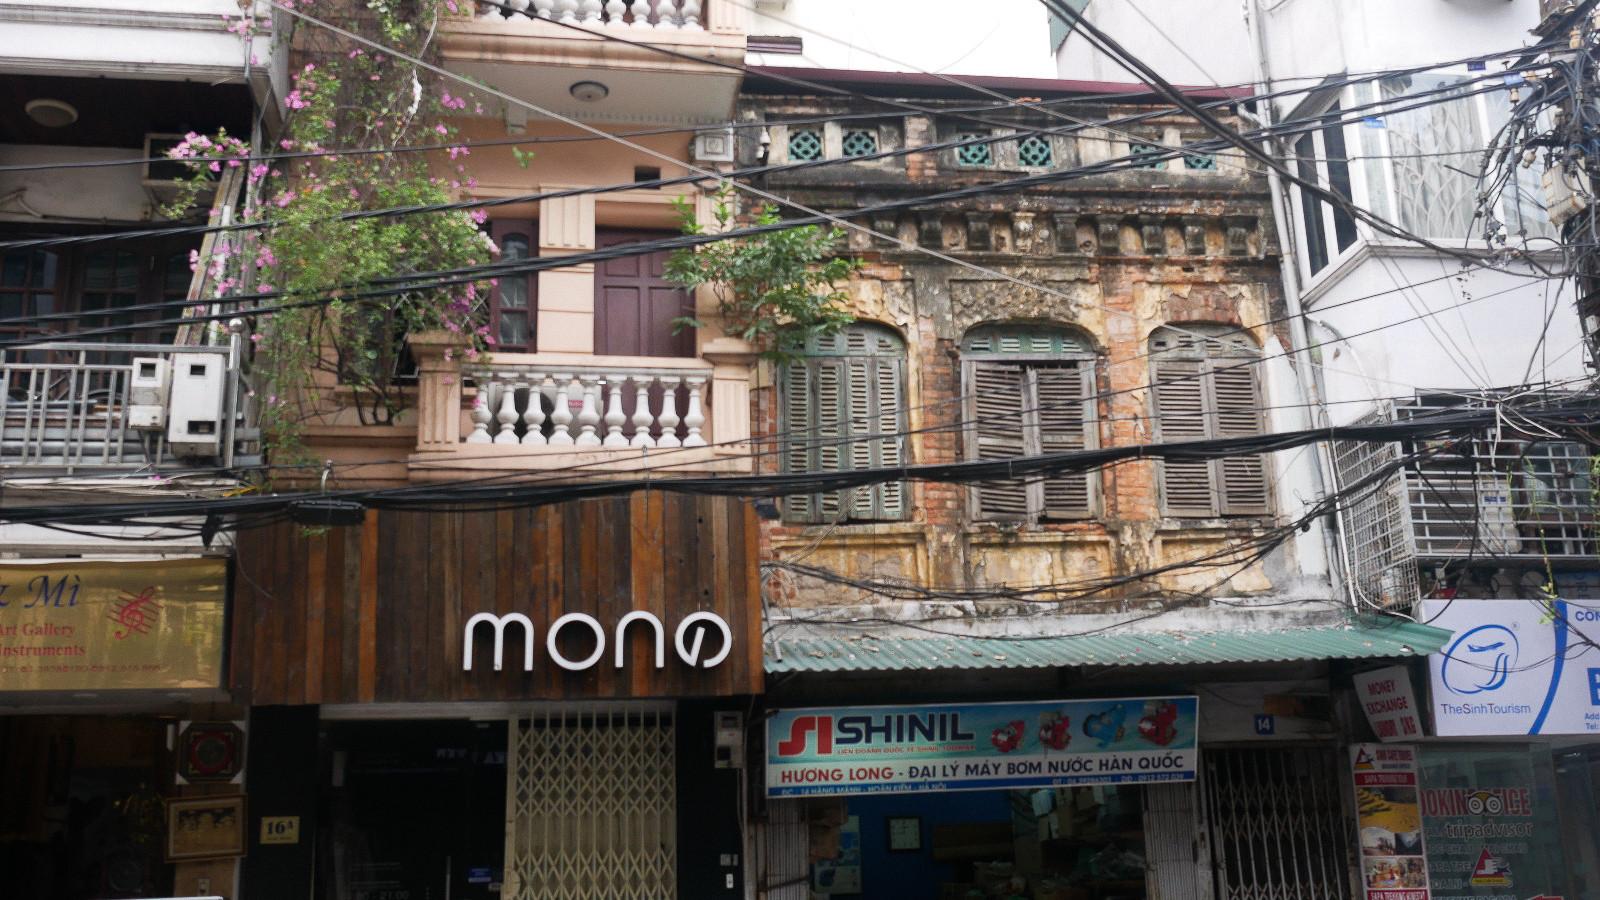 Hanoi Architecture | Photo by Chris Brehc t